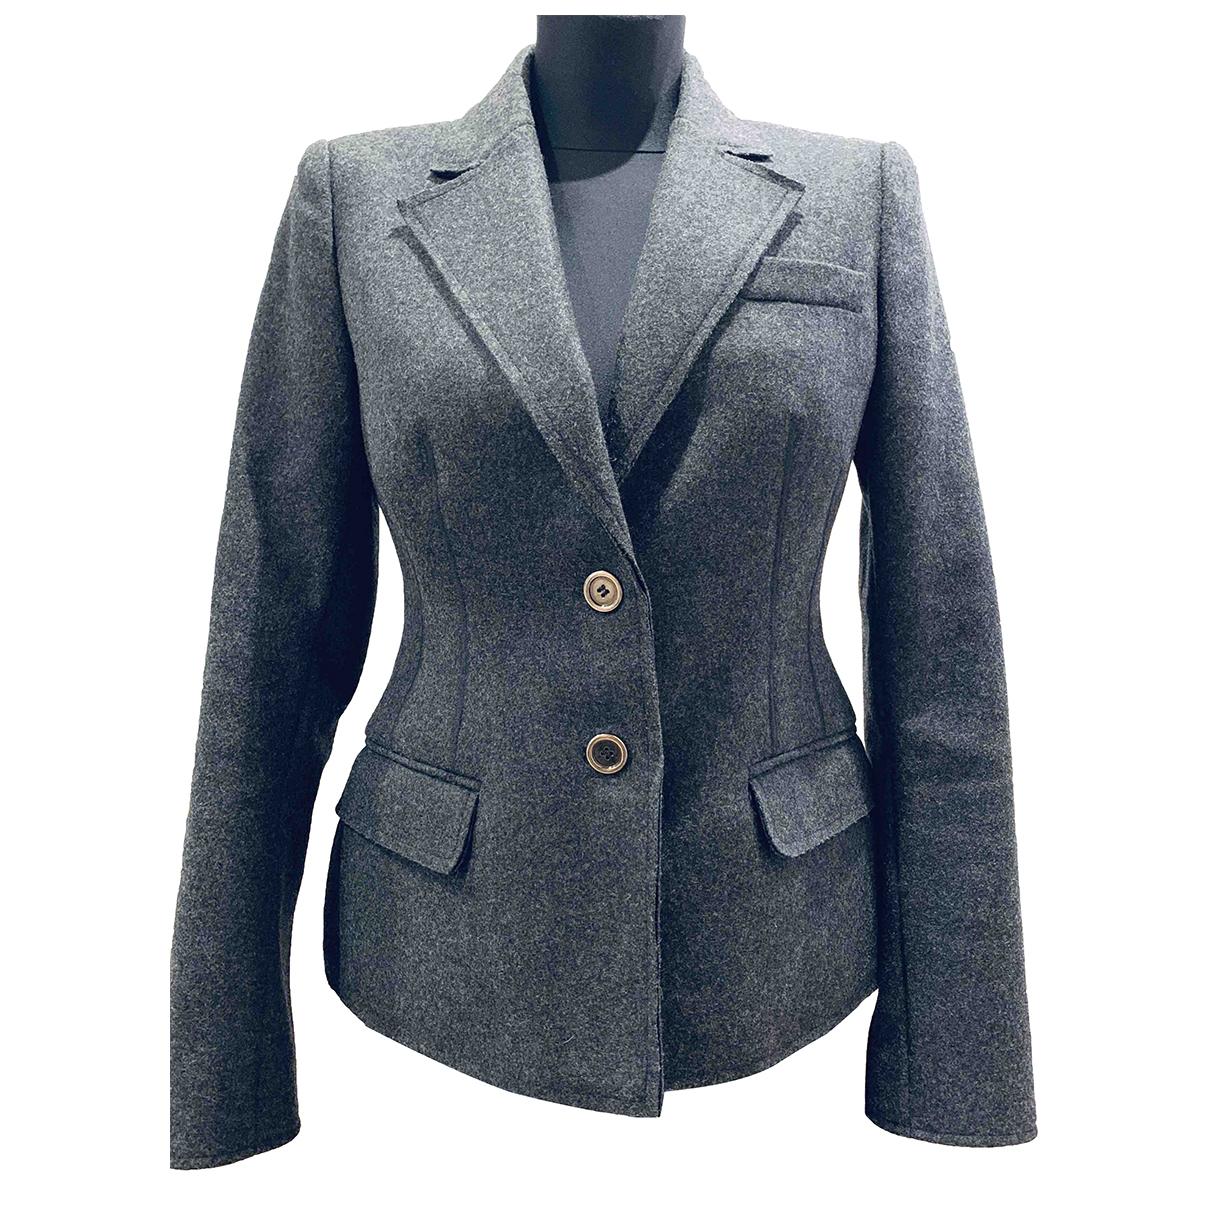 D&g \N Grey Wool jacket for Women M International